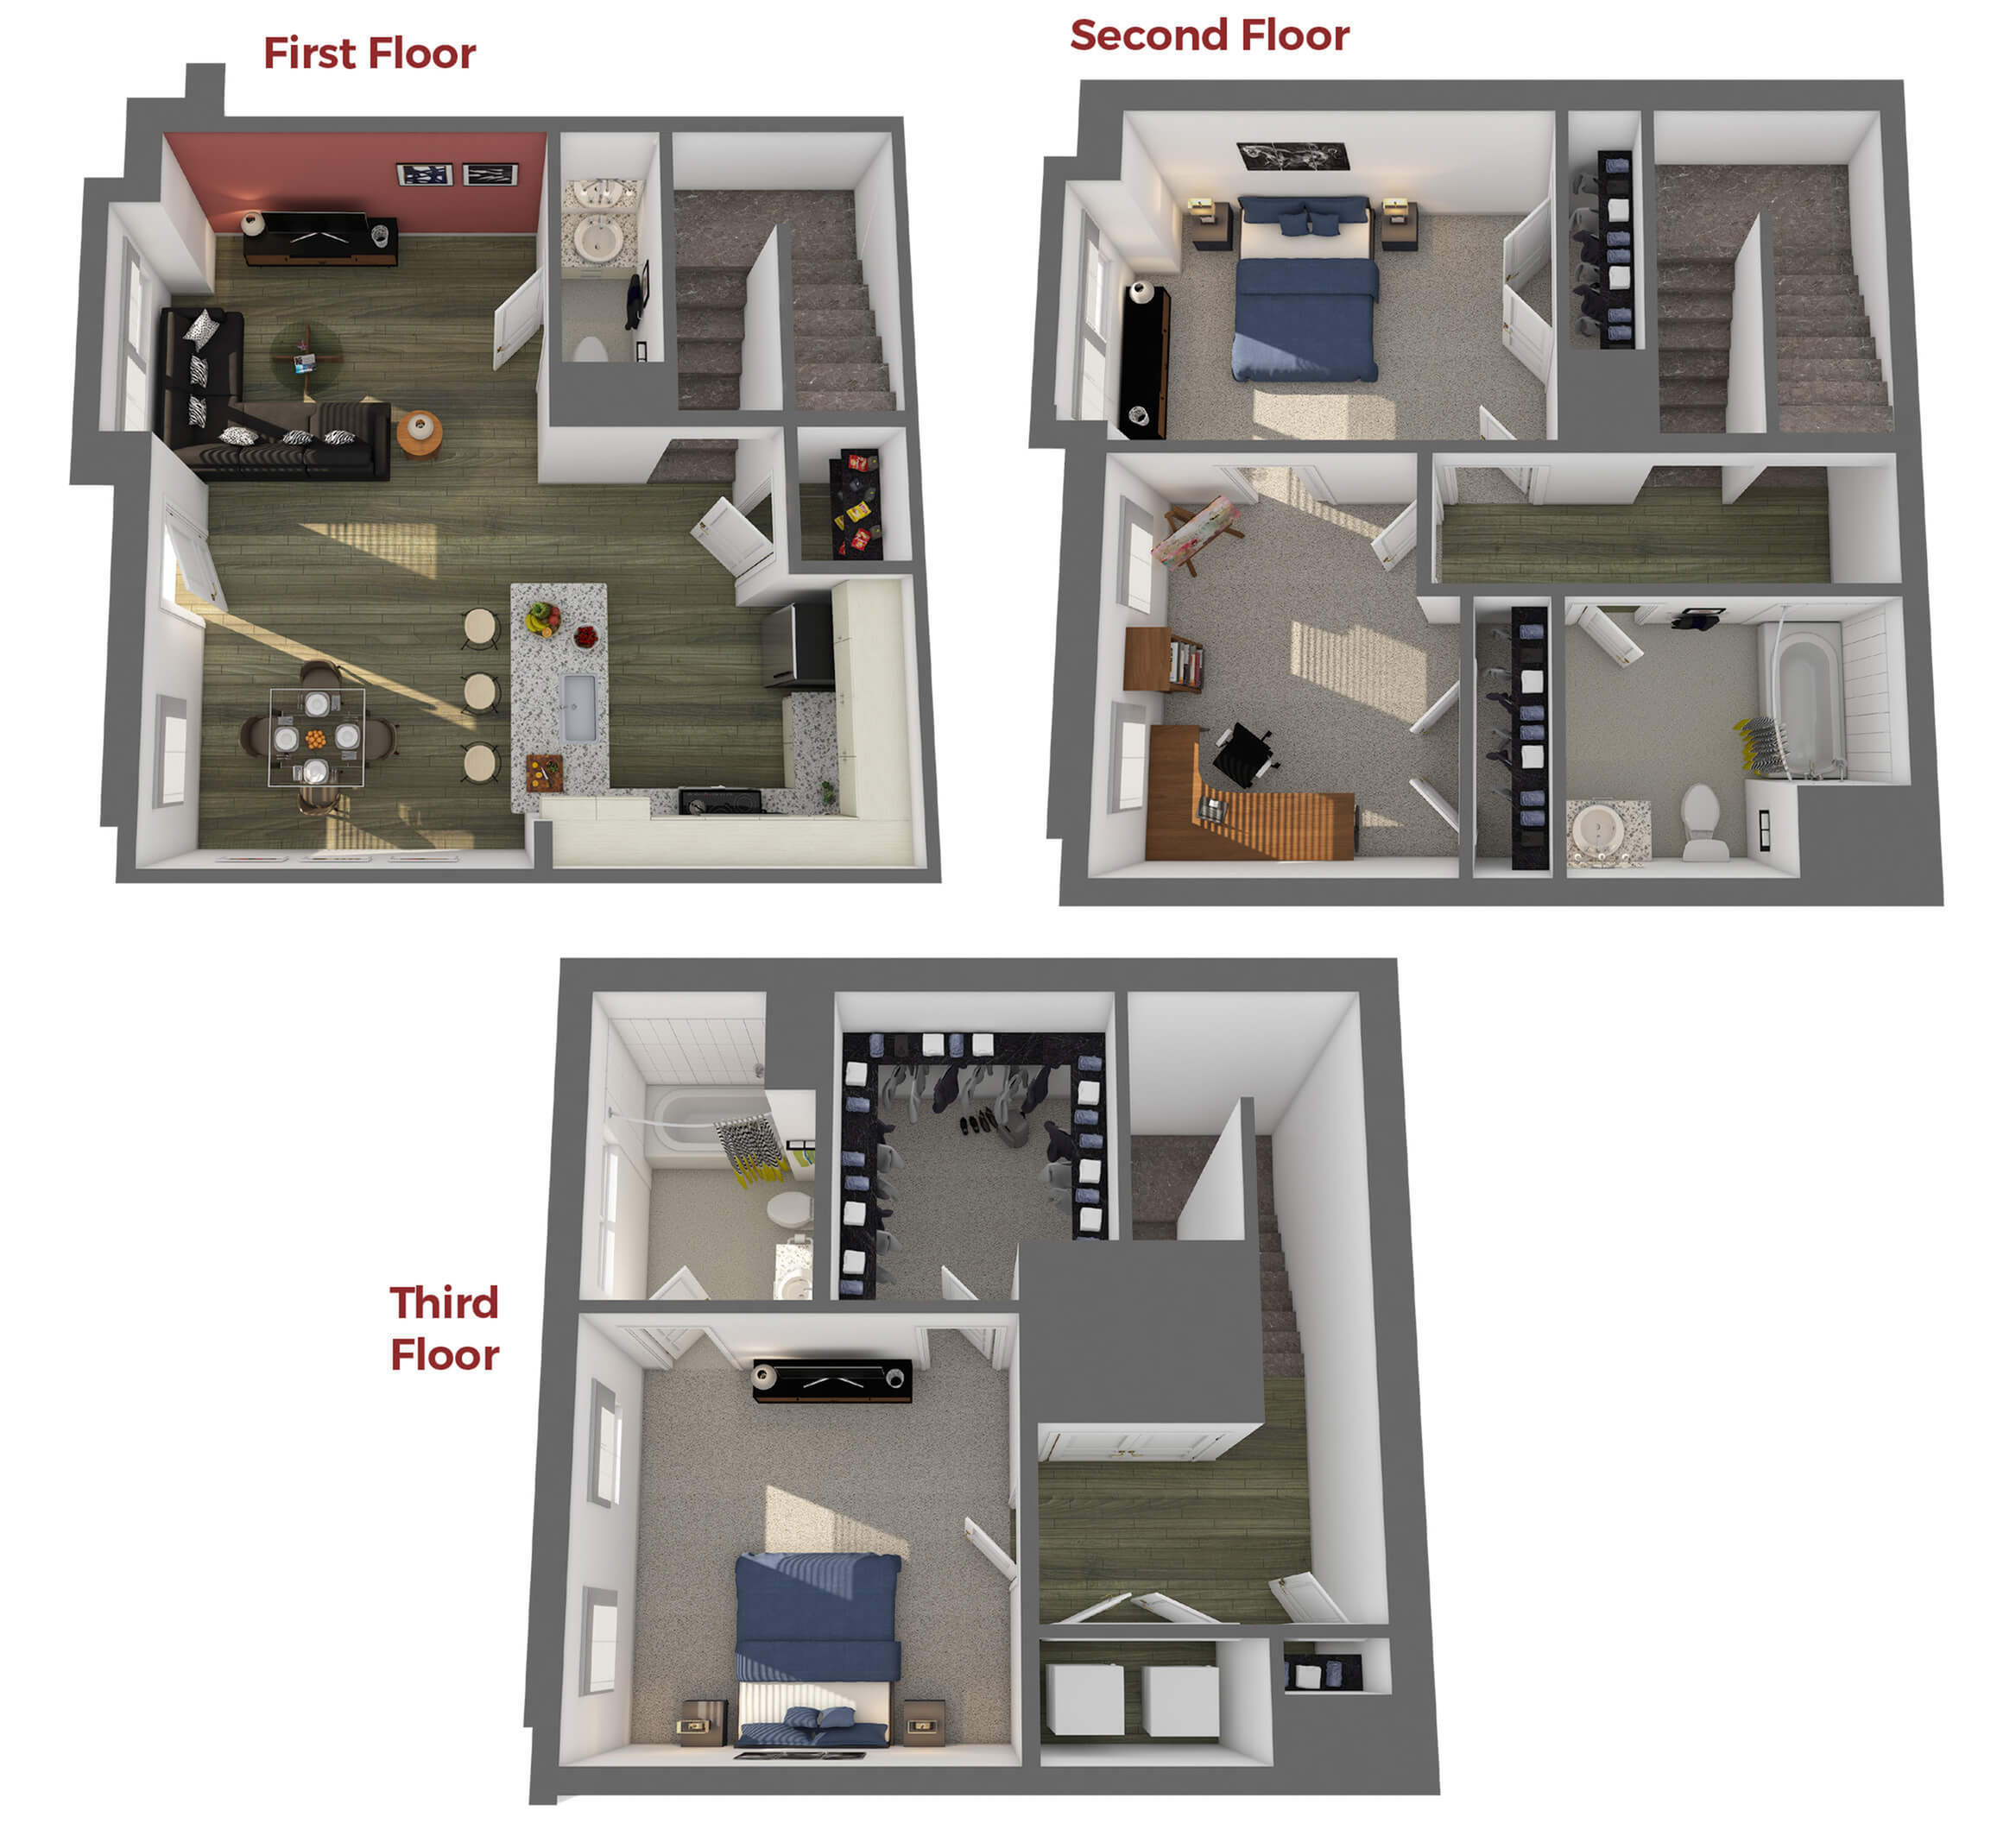 The Strathmore Floor Plan